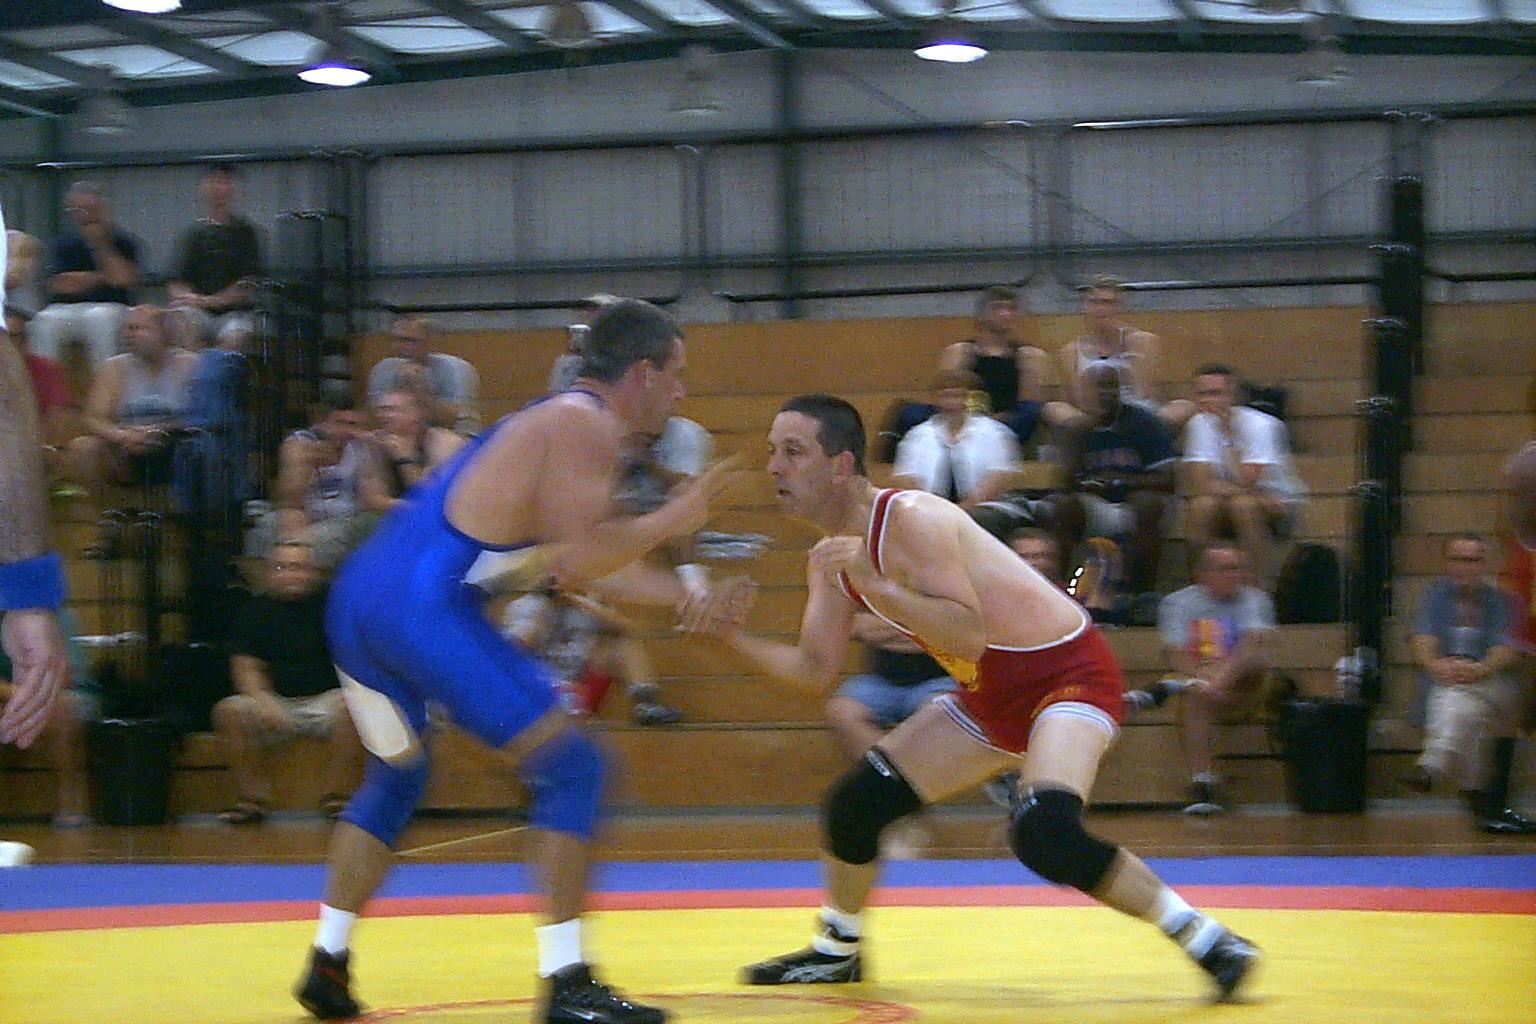 from Warren gay sydney wrestling